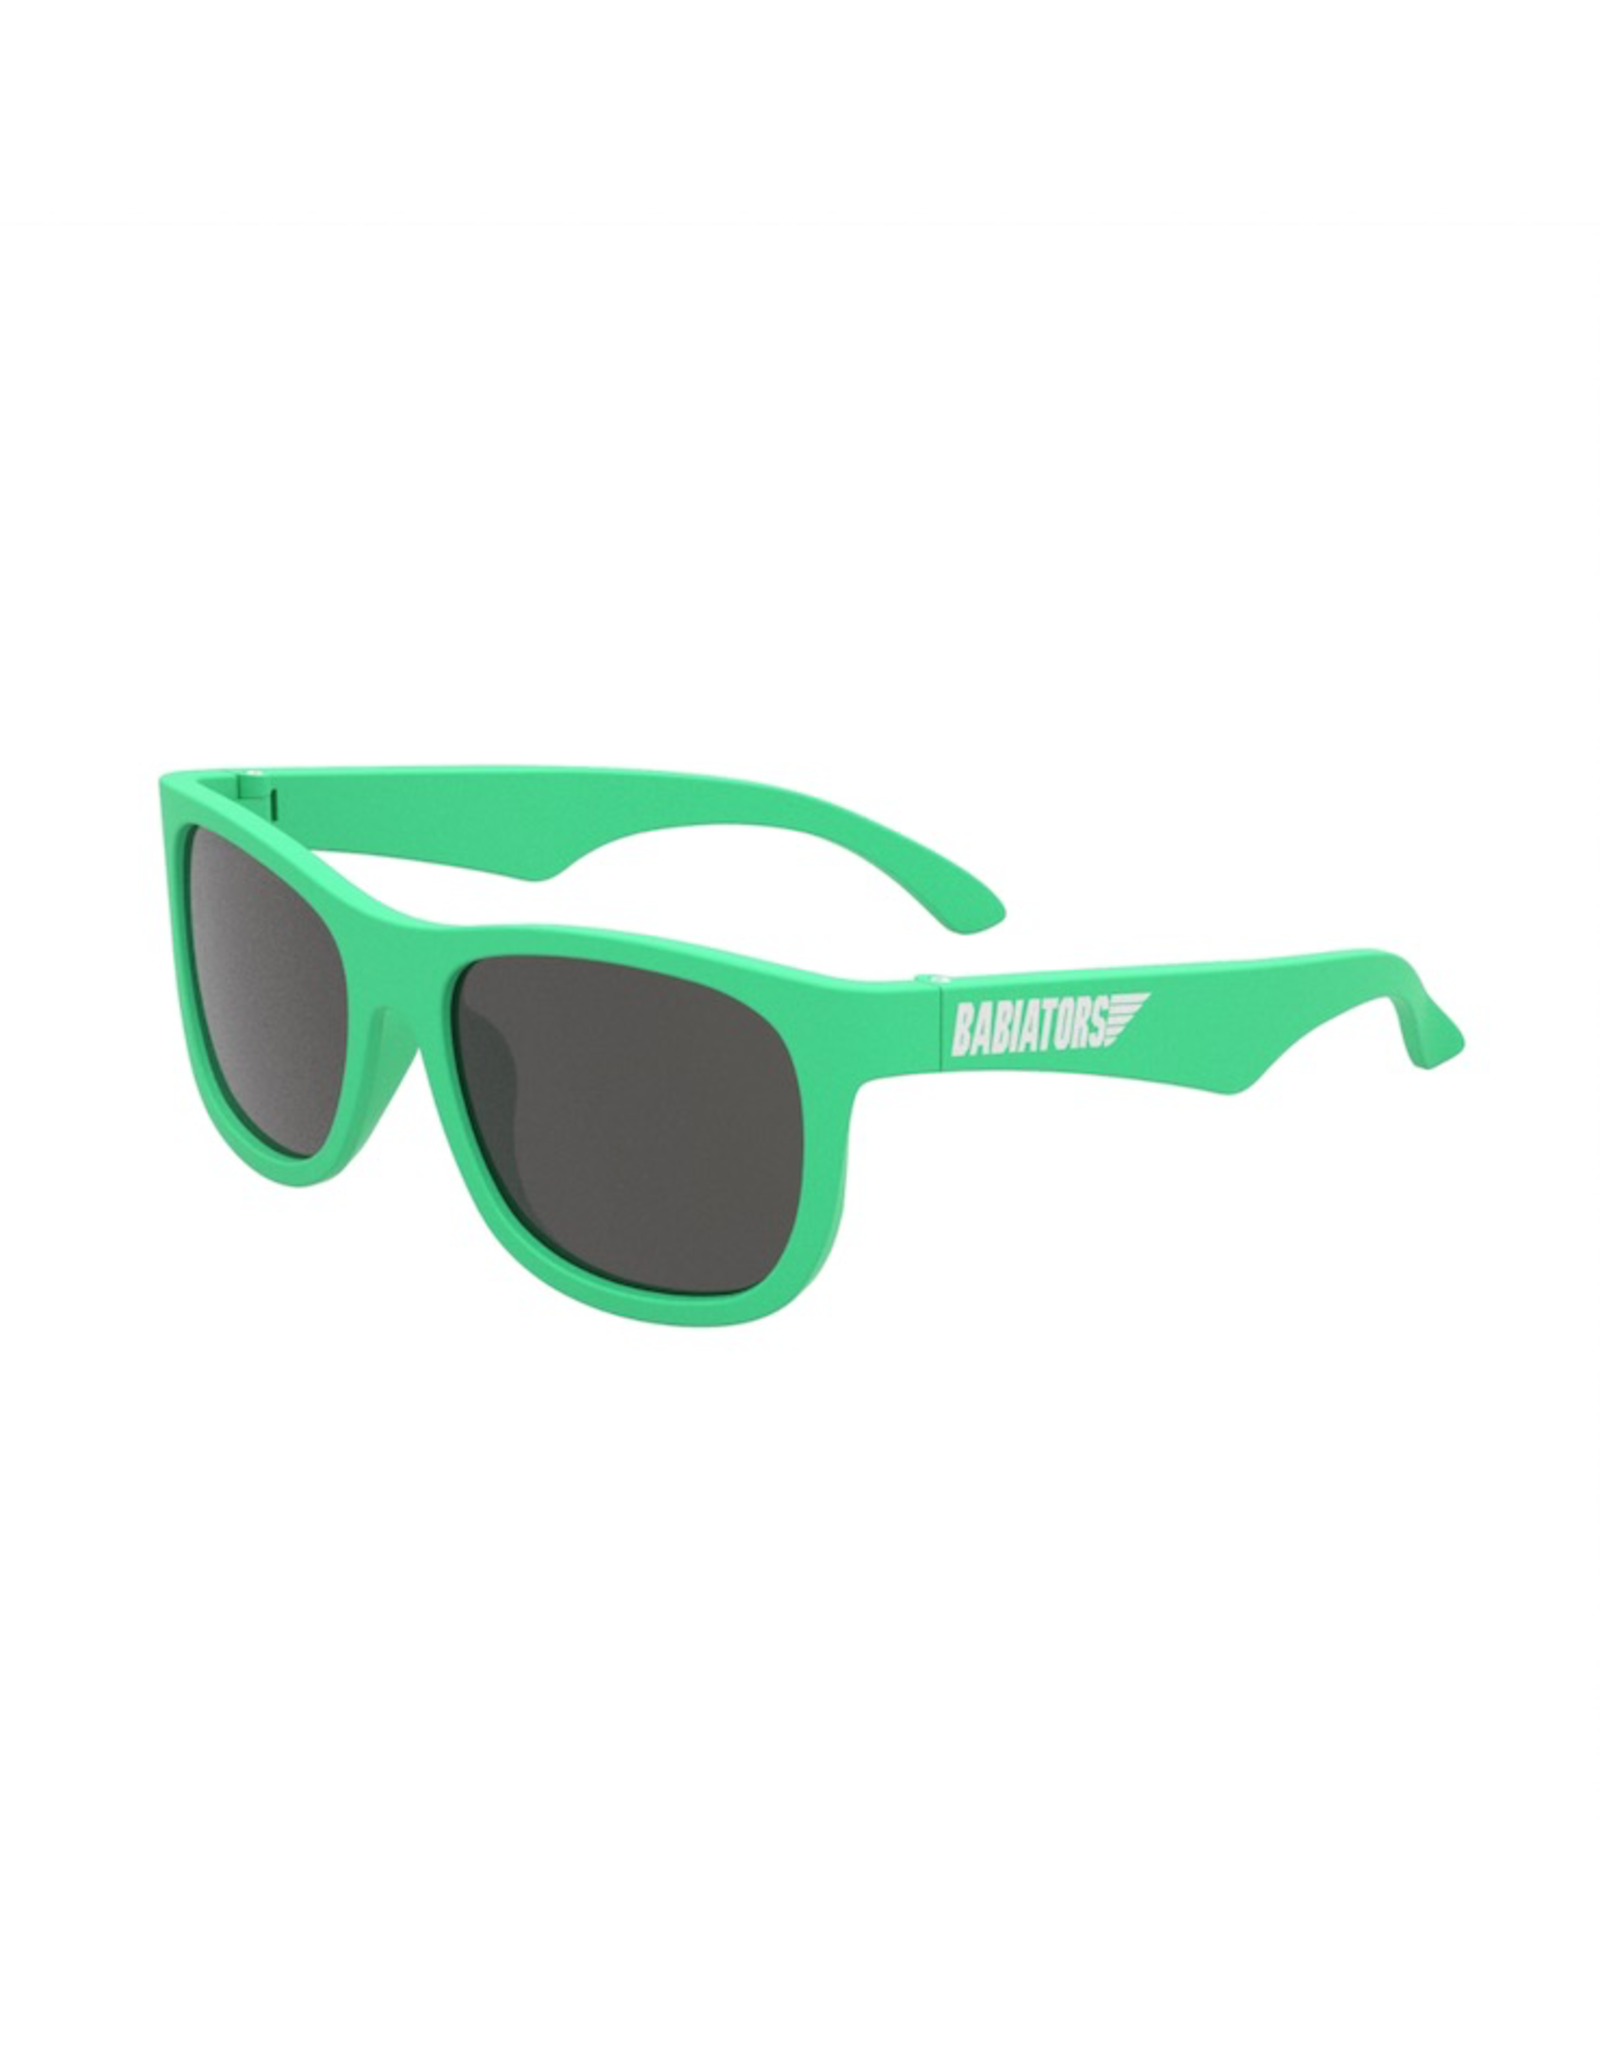 Babiators Limited Edition, Navigator, Sunglasses, Tropical Green